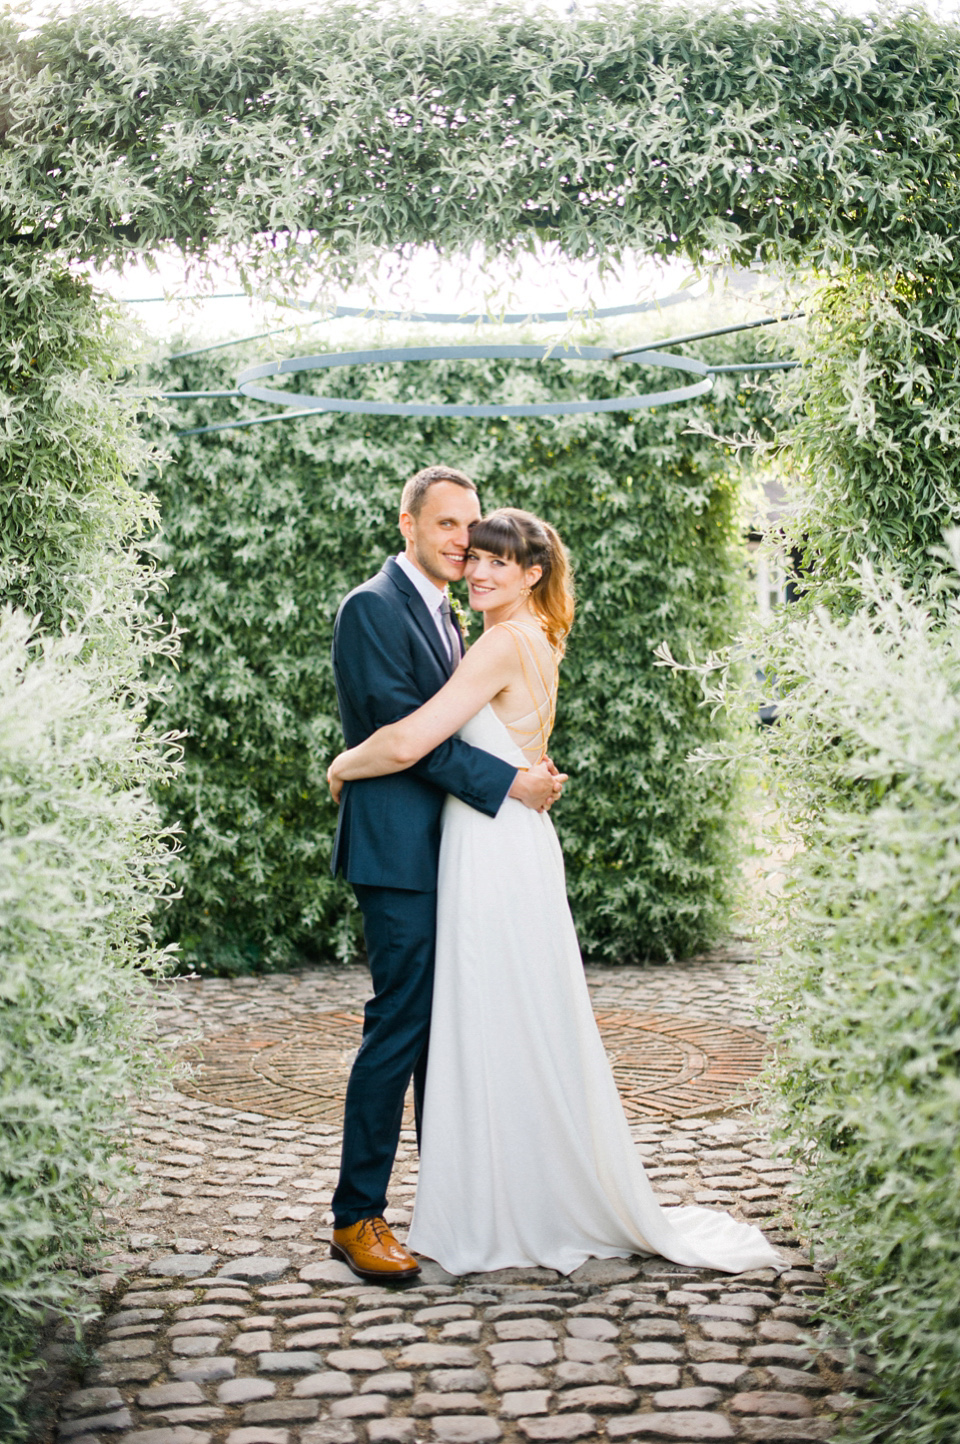 A Bright And Colourful Geometric Inspired And Homespun Barn Wedding Love My Dress Uk Wedding Blog Wedding Directory